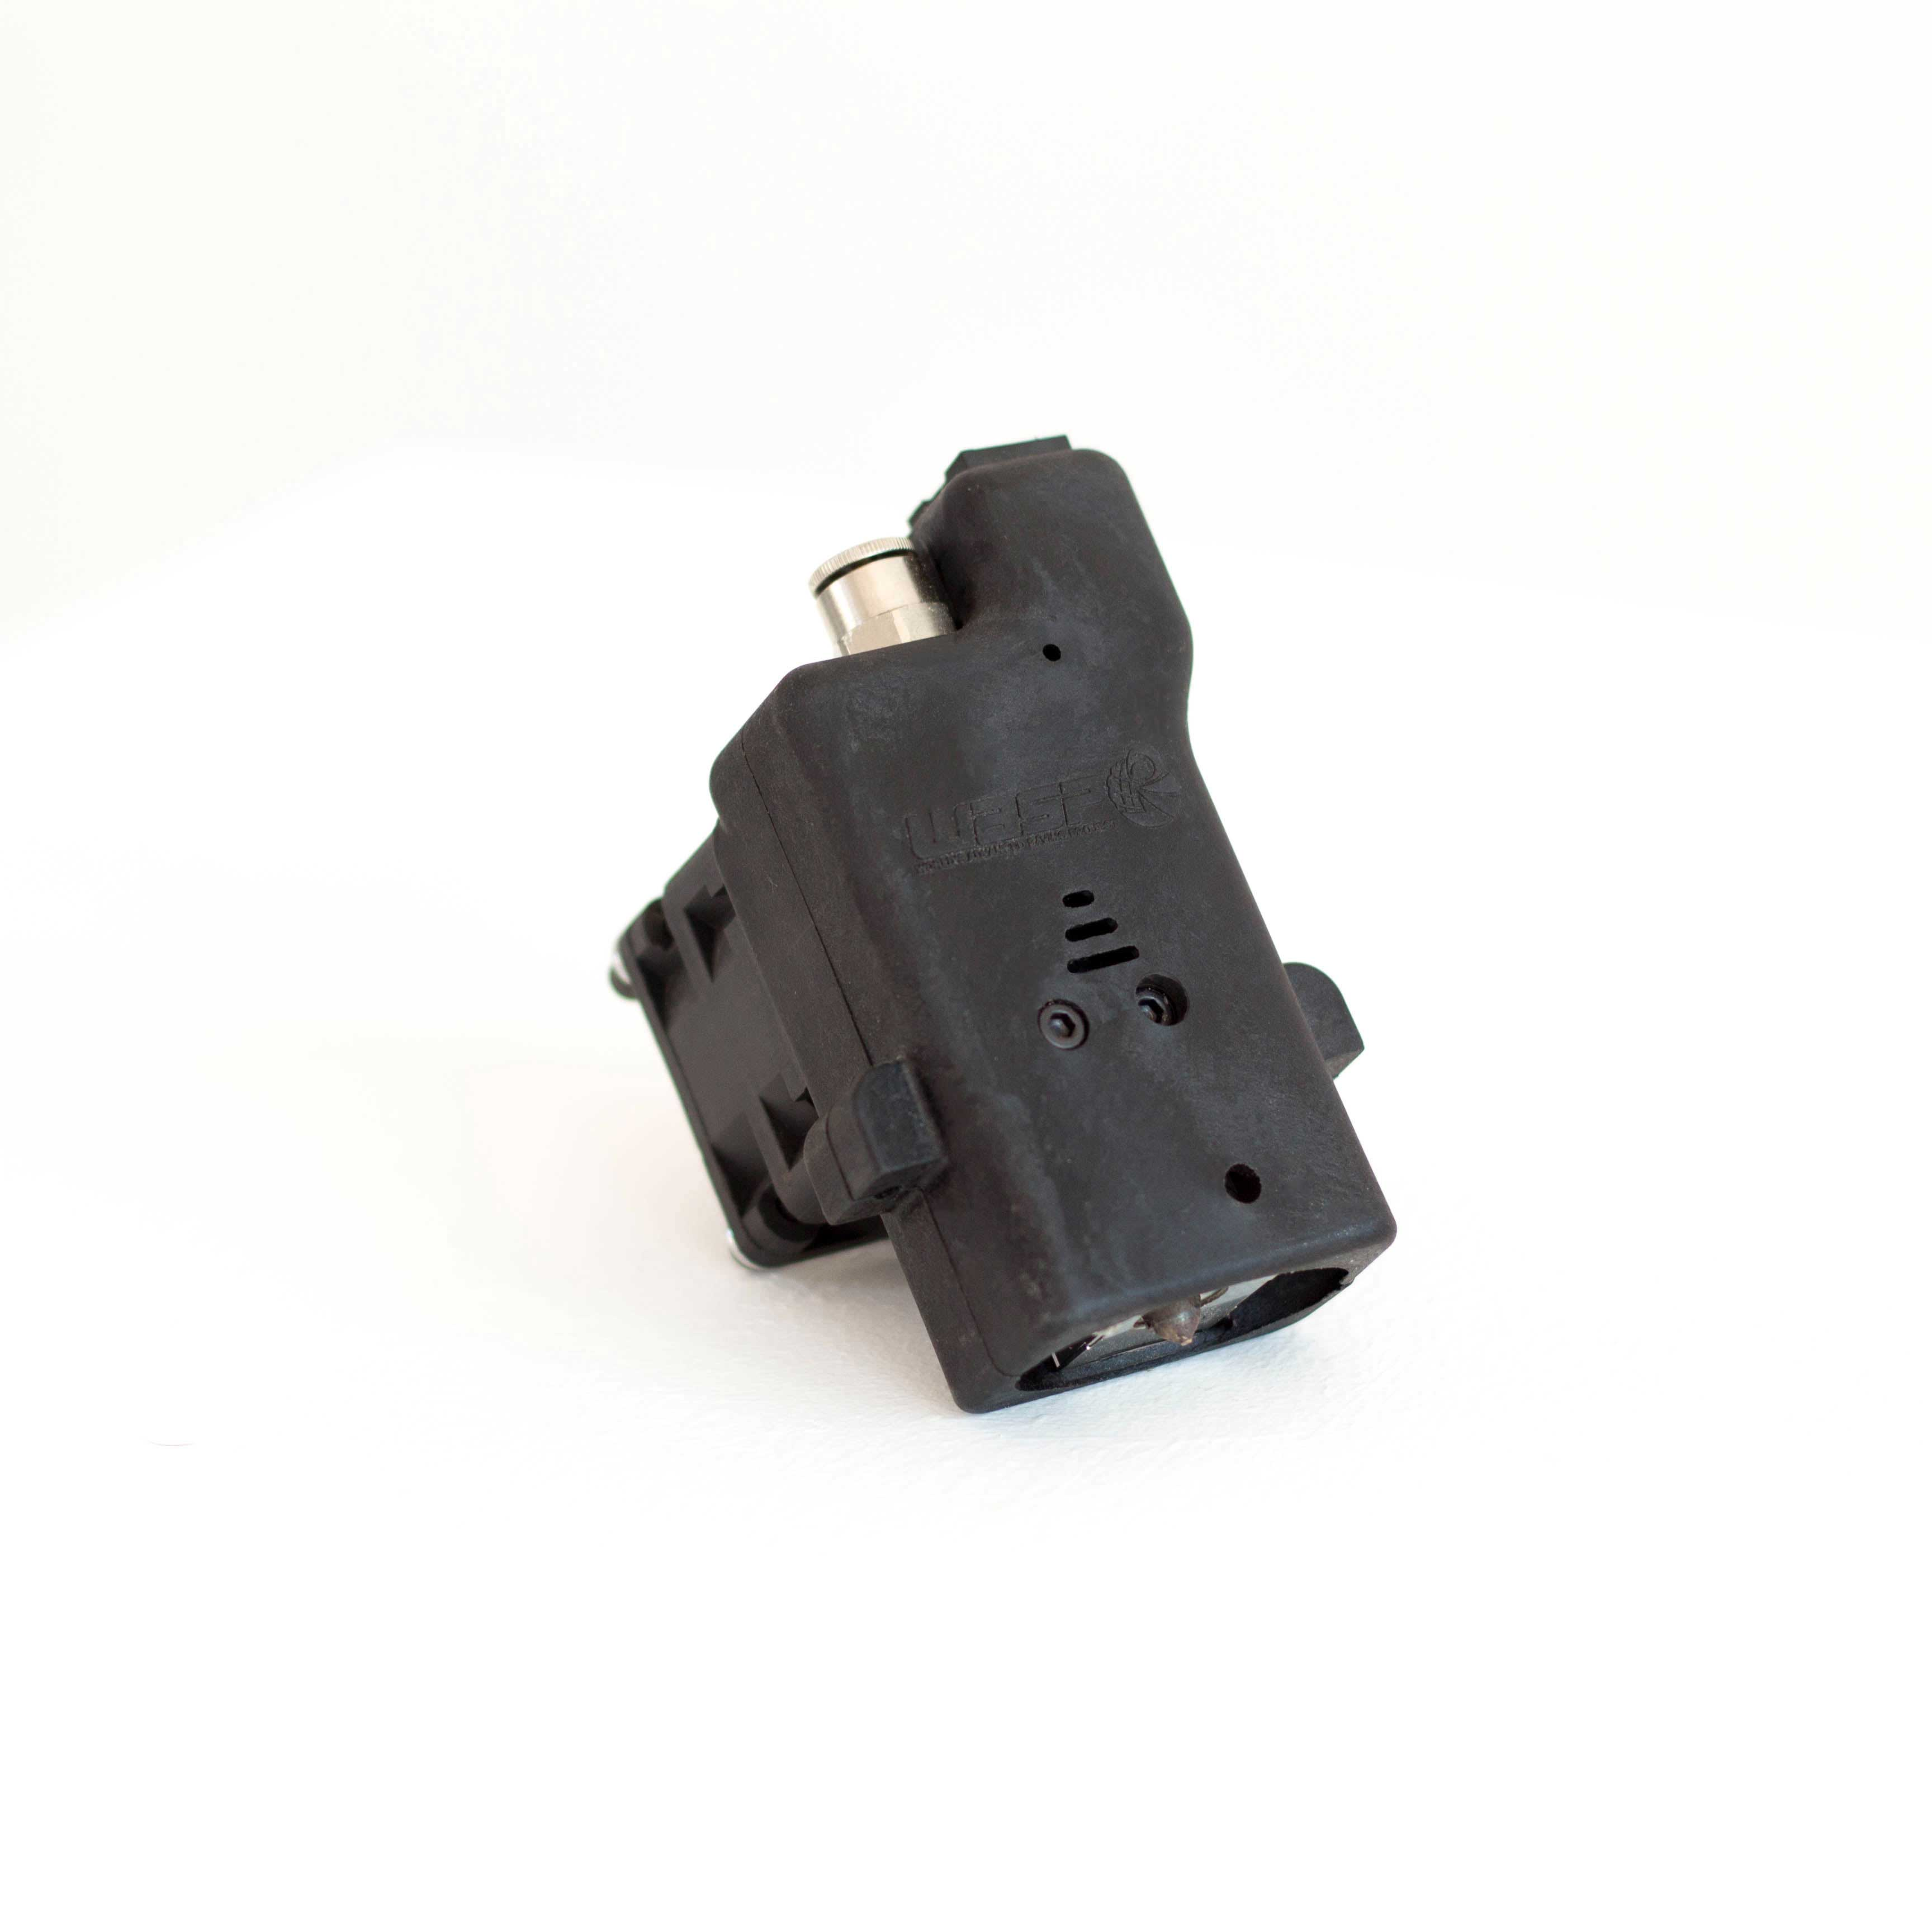 estrusore per stampante 3d - WASP SPITFIRE BLACK EXTEUDER - PHOTO2